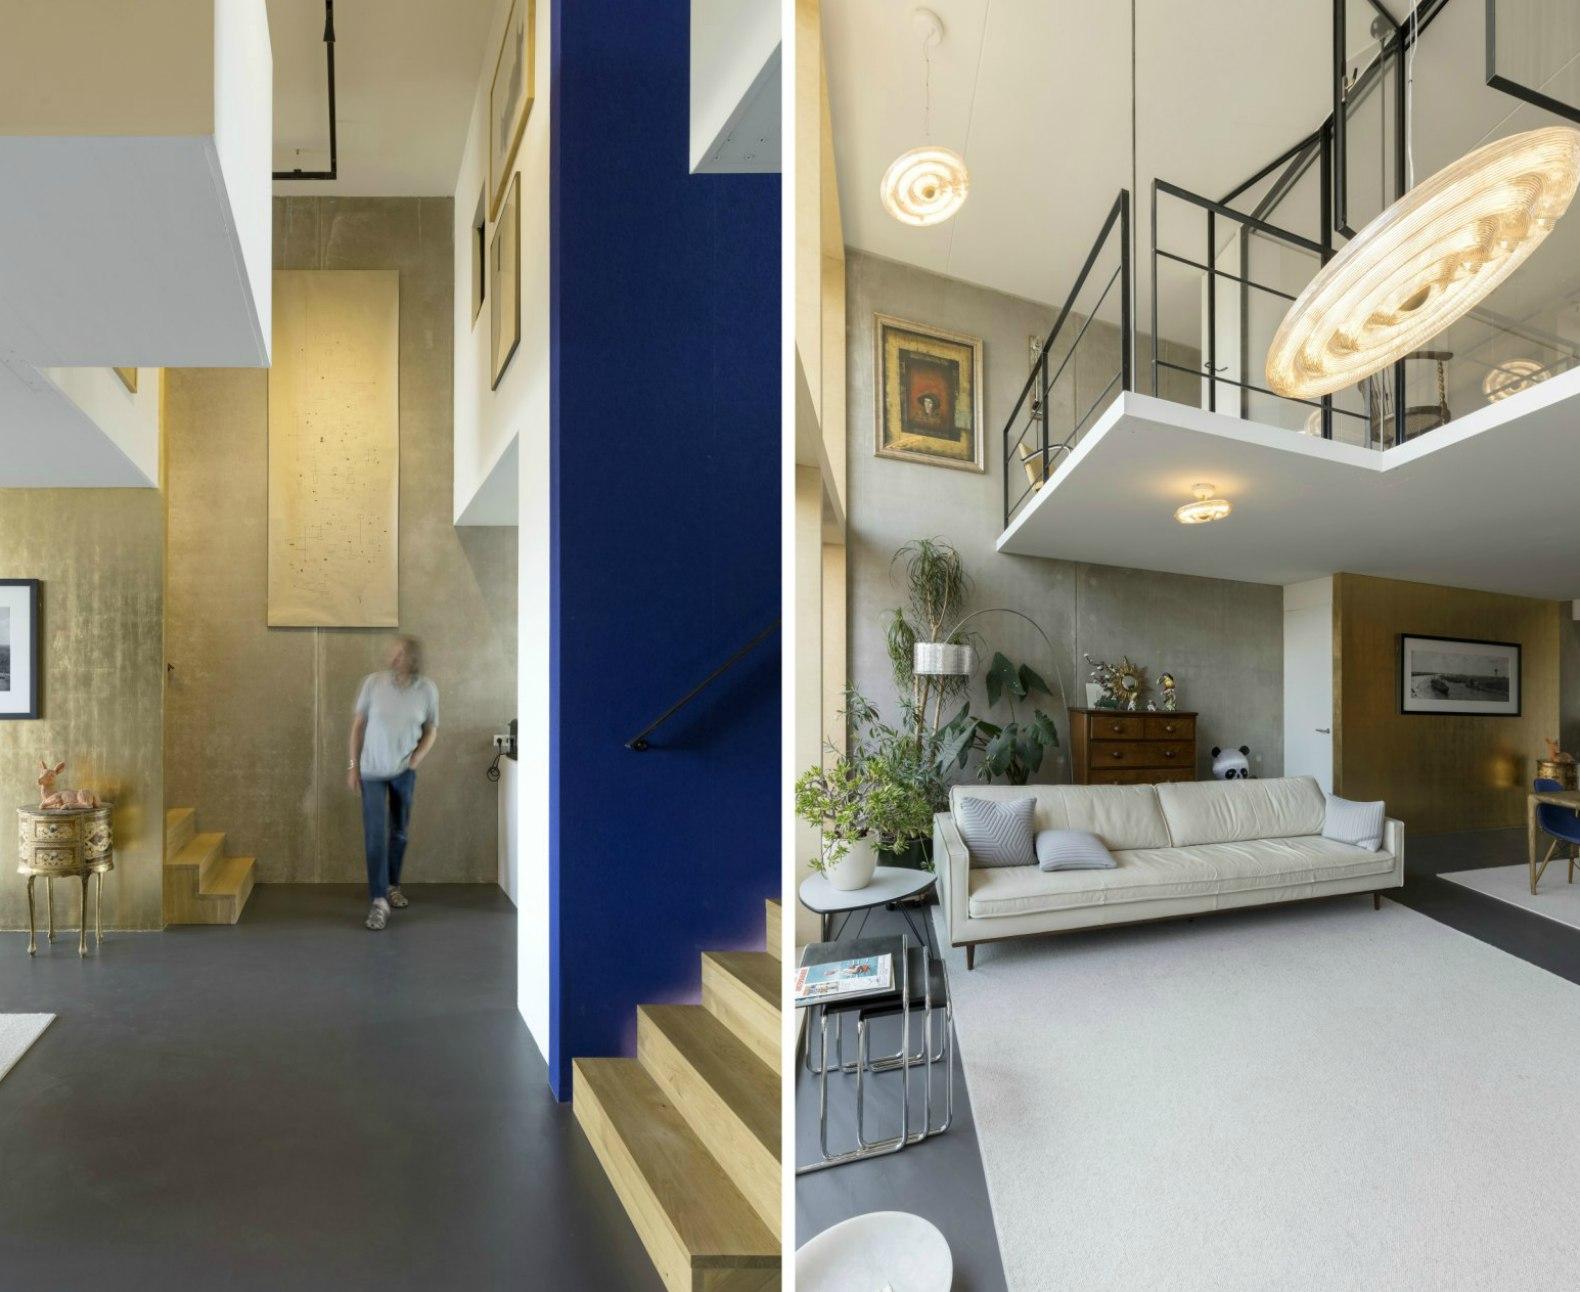 Best Kitchen Gallery: Amsterdam's Efficient Superlofts Adapt To Homeowners' Needs Over The of Efficient Home Loft Design on rachelxblog.com